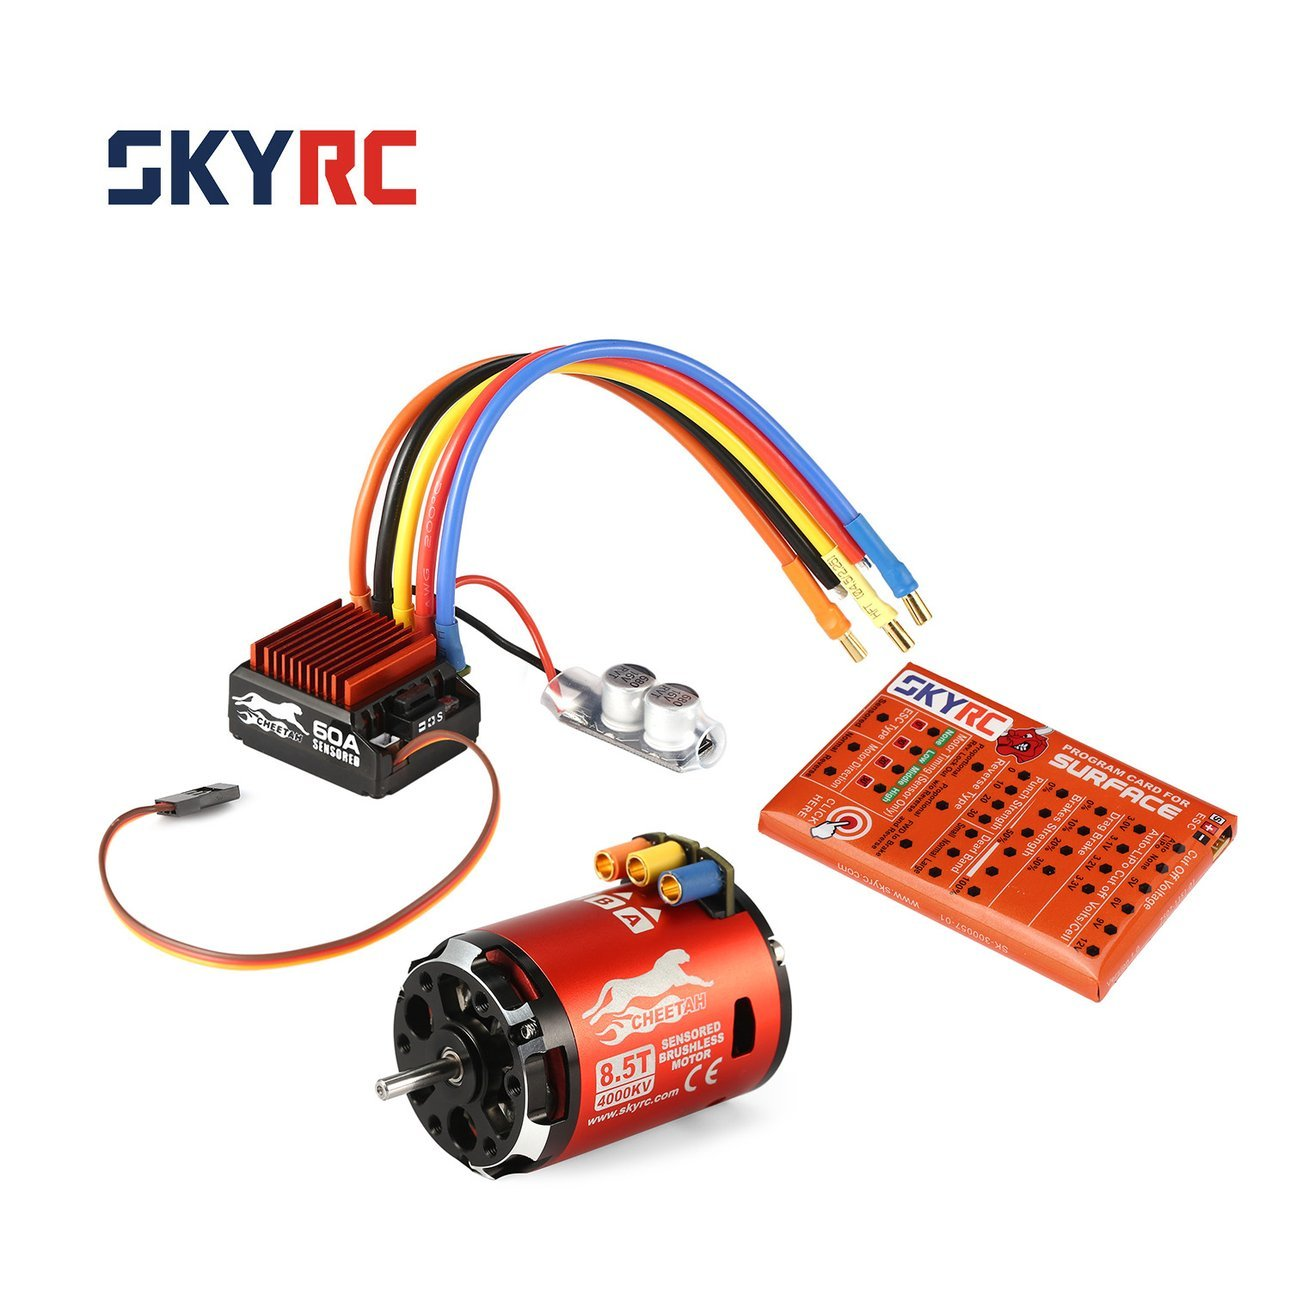 Ballylelly SKYRC 4000KV 8.5T SensoROT Brushless Motor 60A ESC Programmkarte für 1/10 Auto